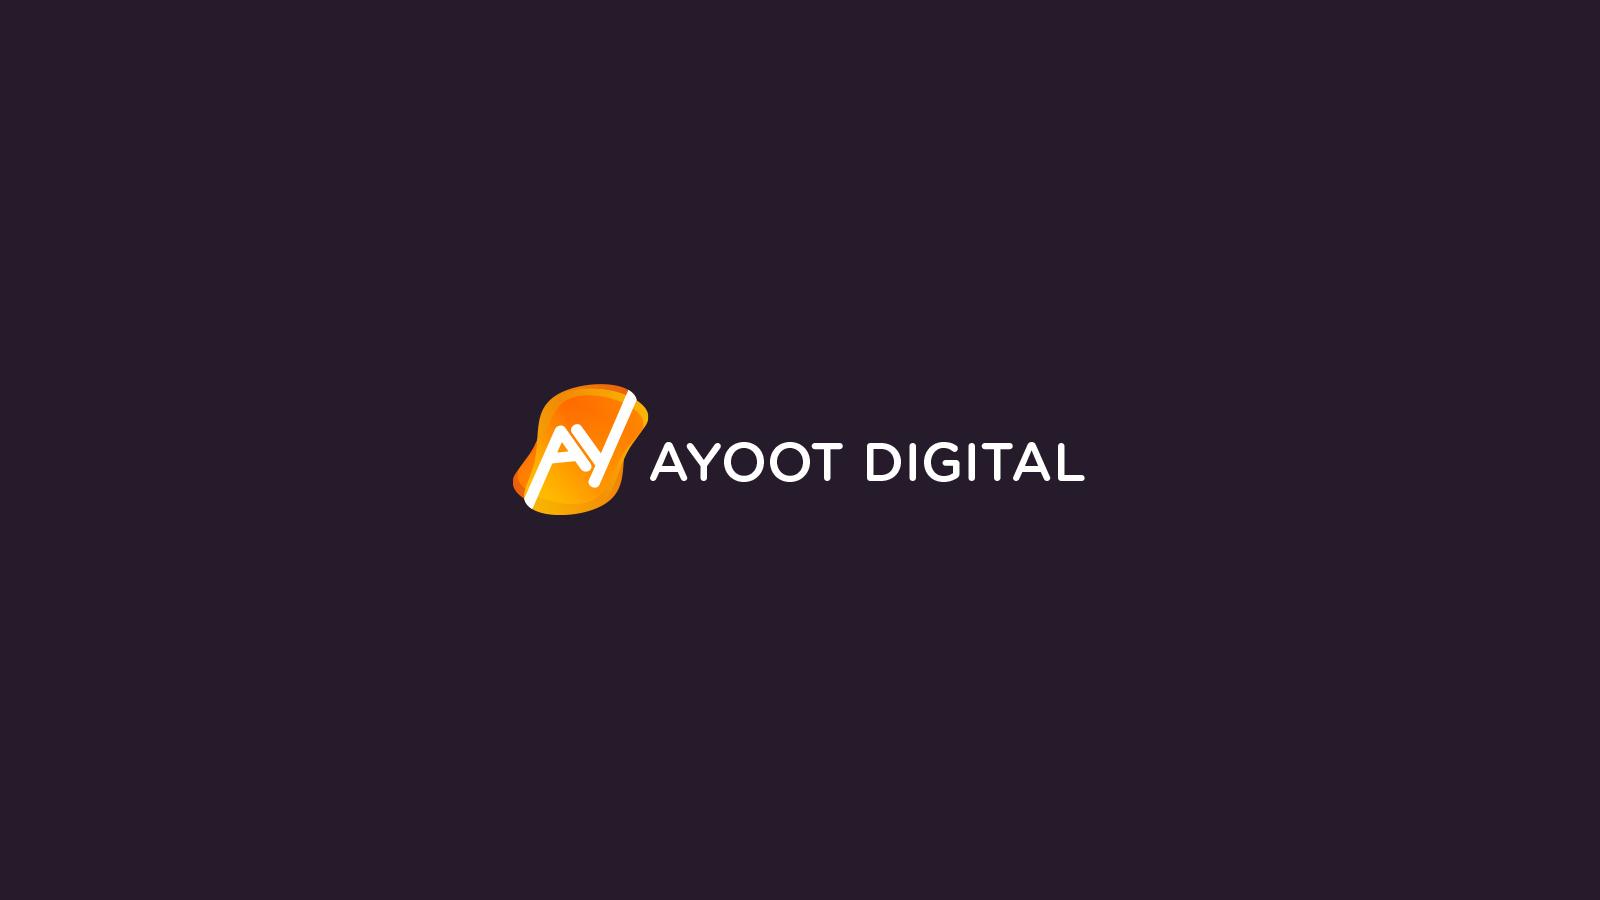 Ayoot Digital 4.jpg